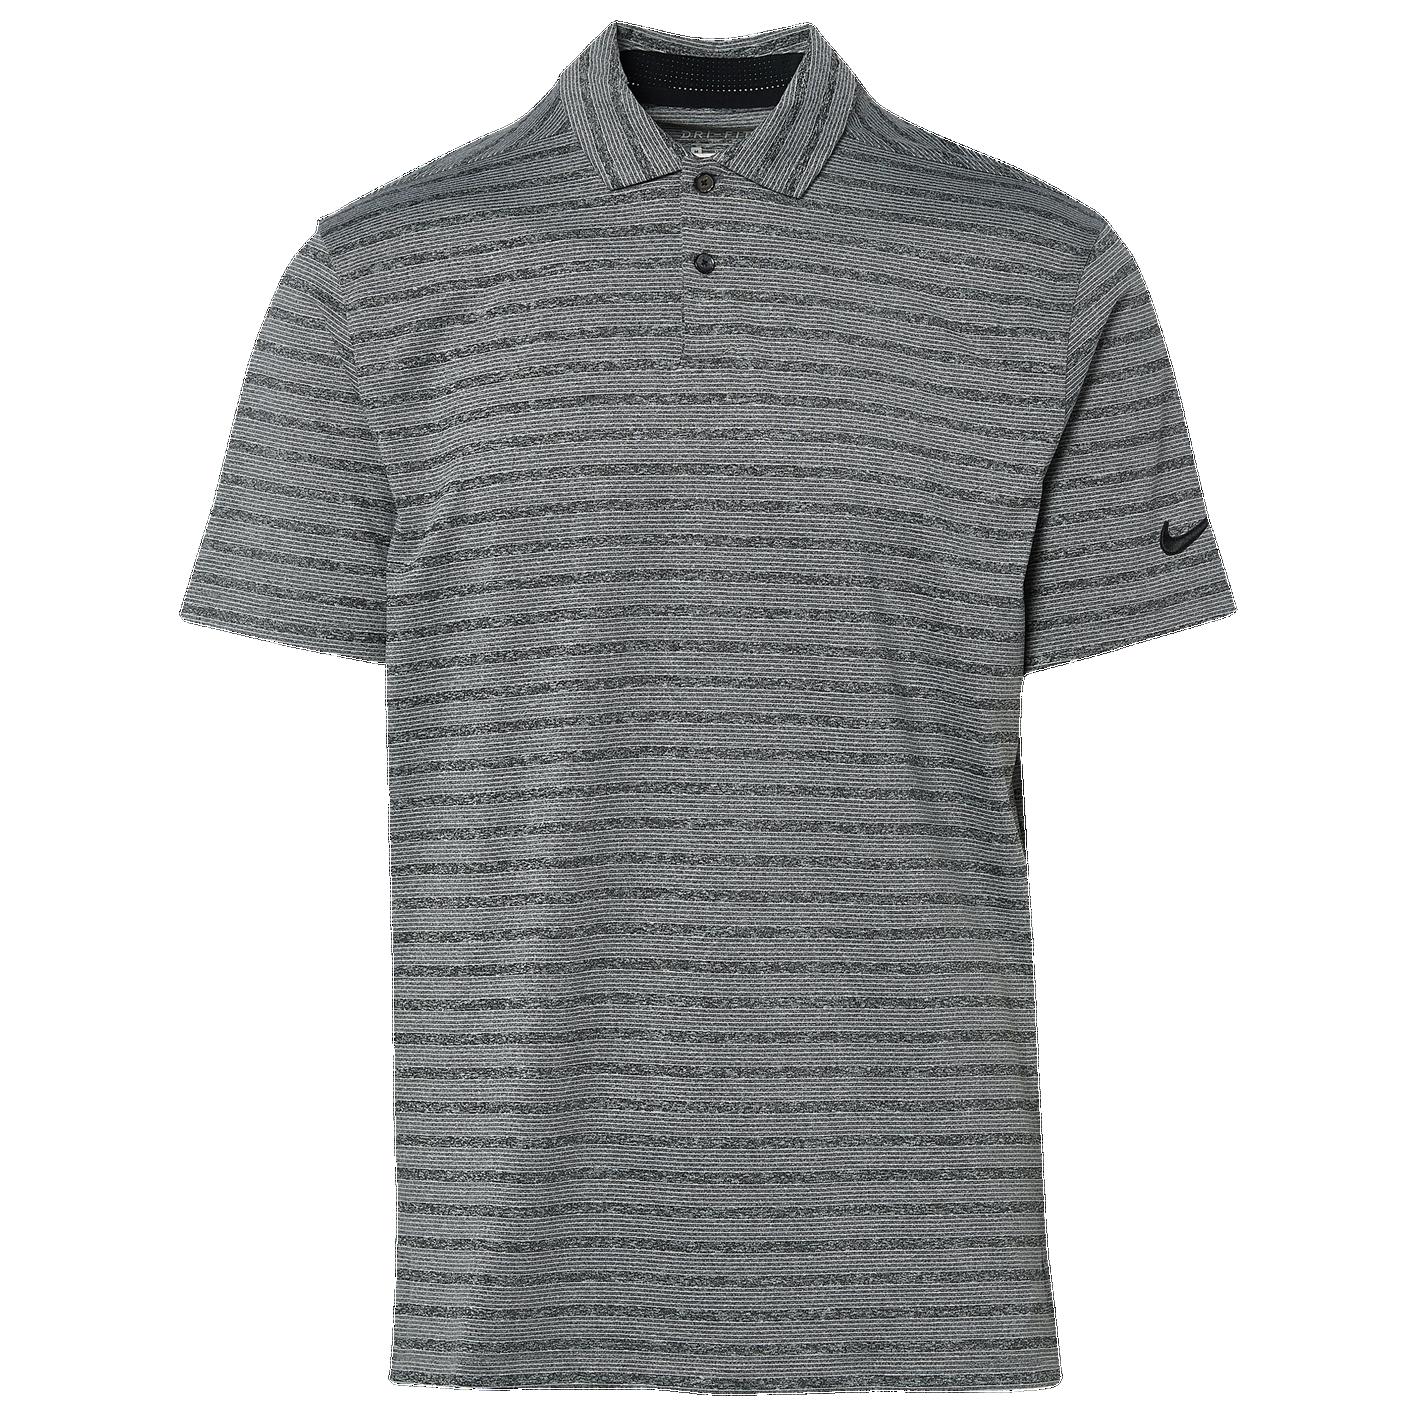 53ad4d0f28 Nike Dry Vapor Stripe Golf Polo - Men's - Golf - Clothing - Black/Pure